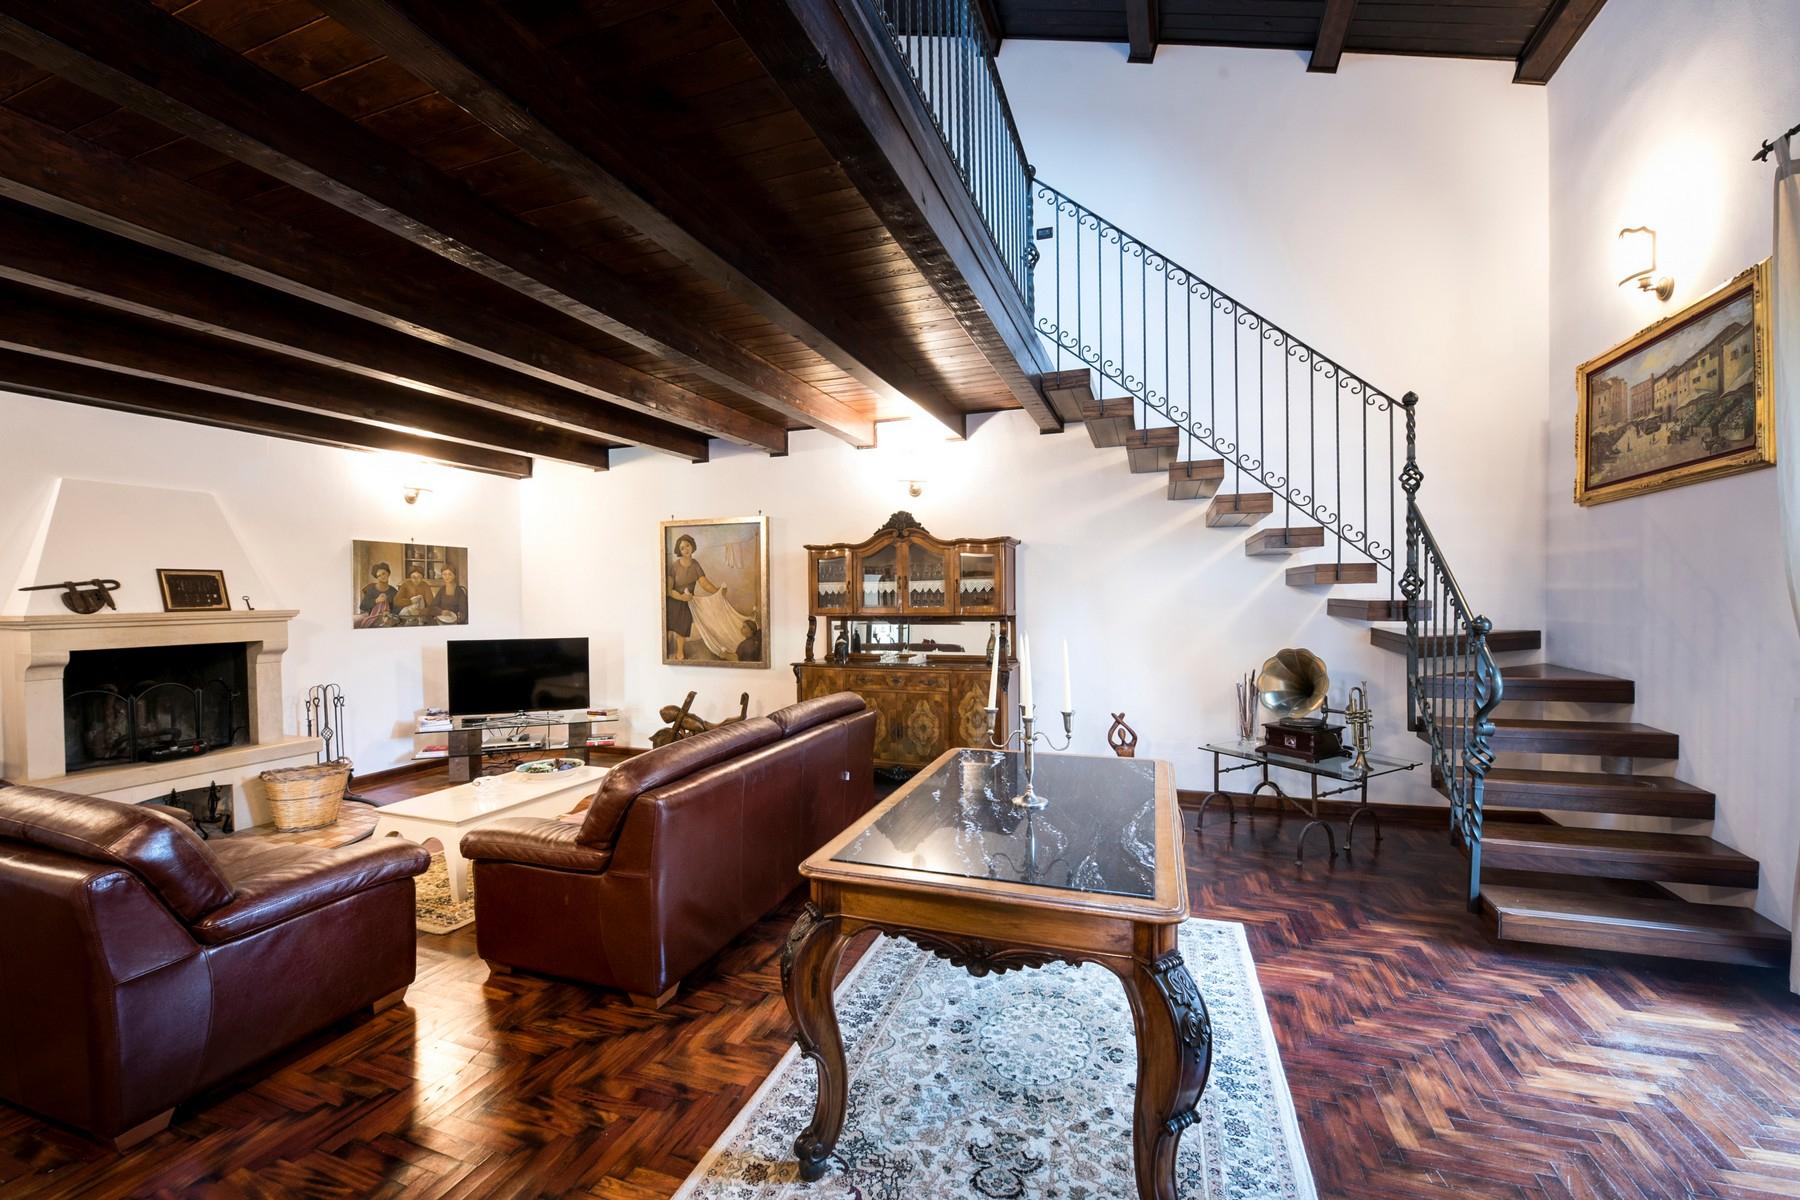 Casa indipendente in Vendita a Noto: 5 locali, 300 mq - Foto 15